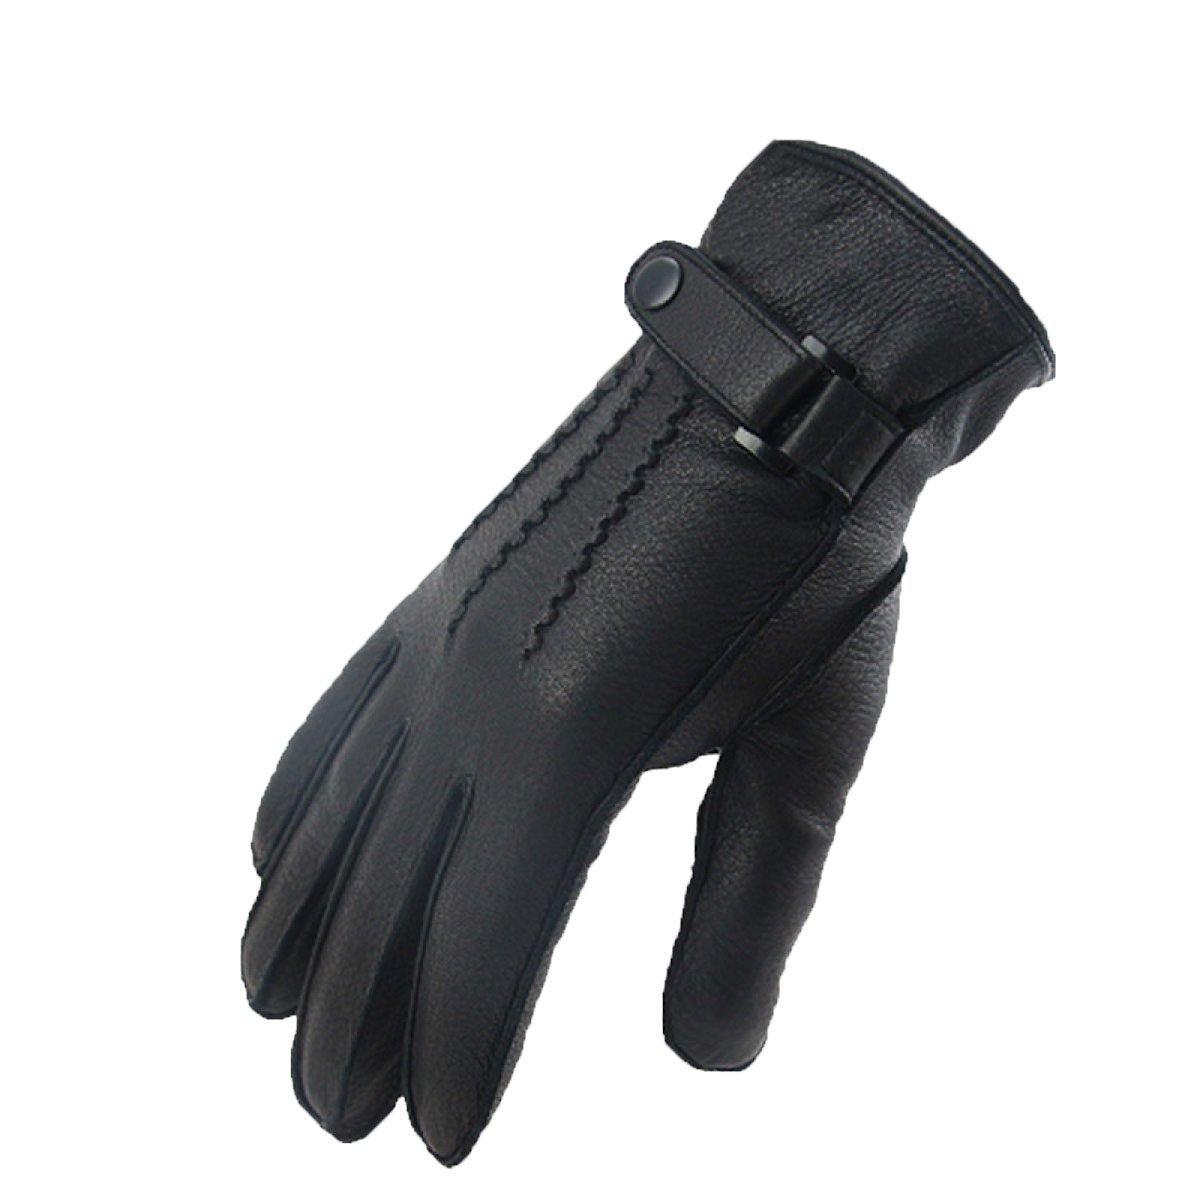 GBT Männer im Freien Reiten warme Handschuhe